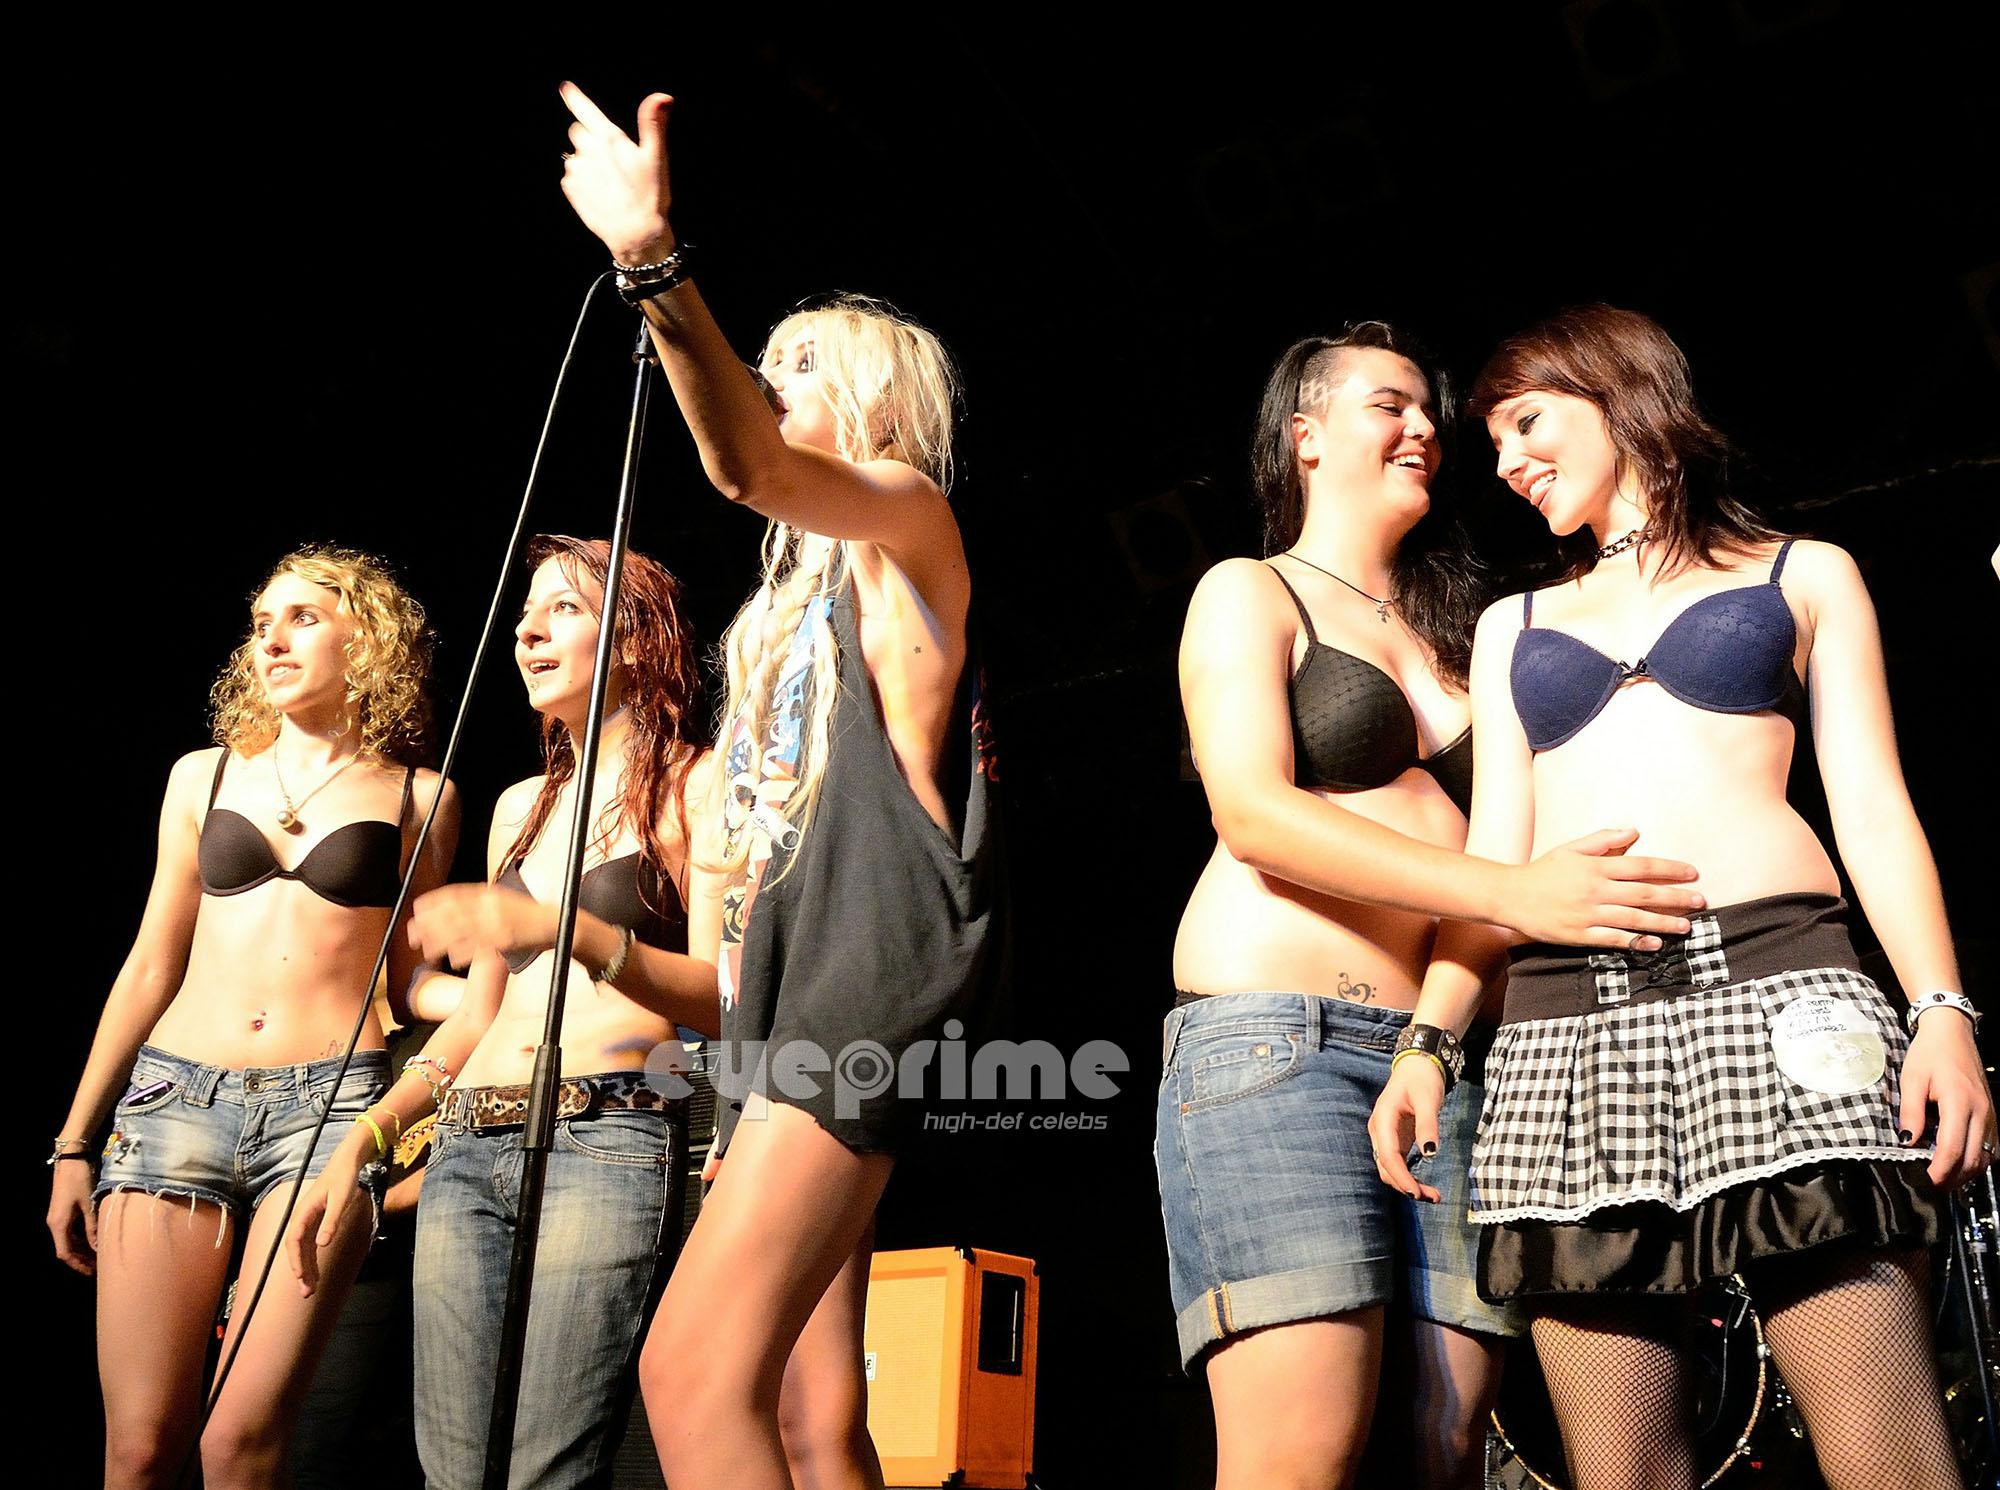 Taylor Momsen: Razzmatazz in Barcelona, July 6